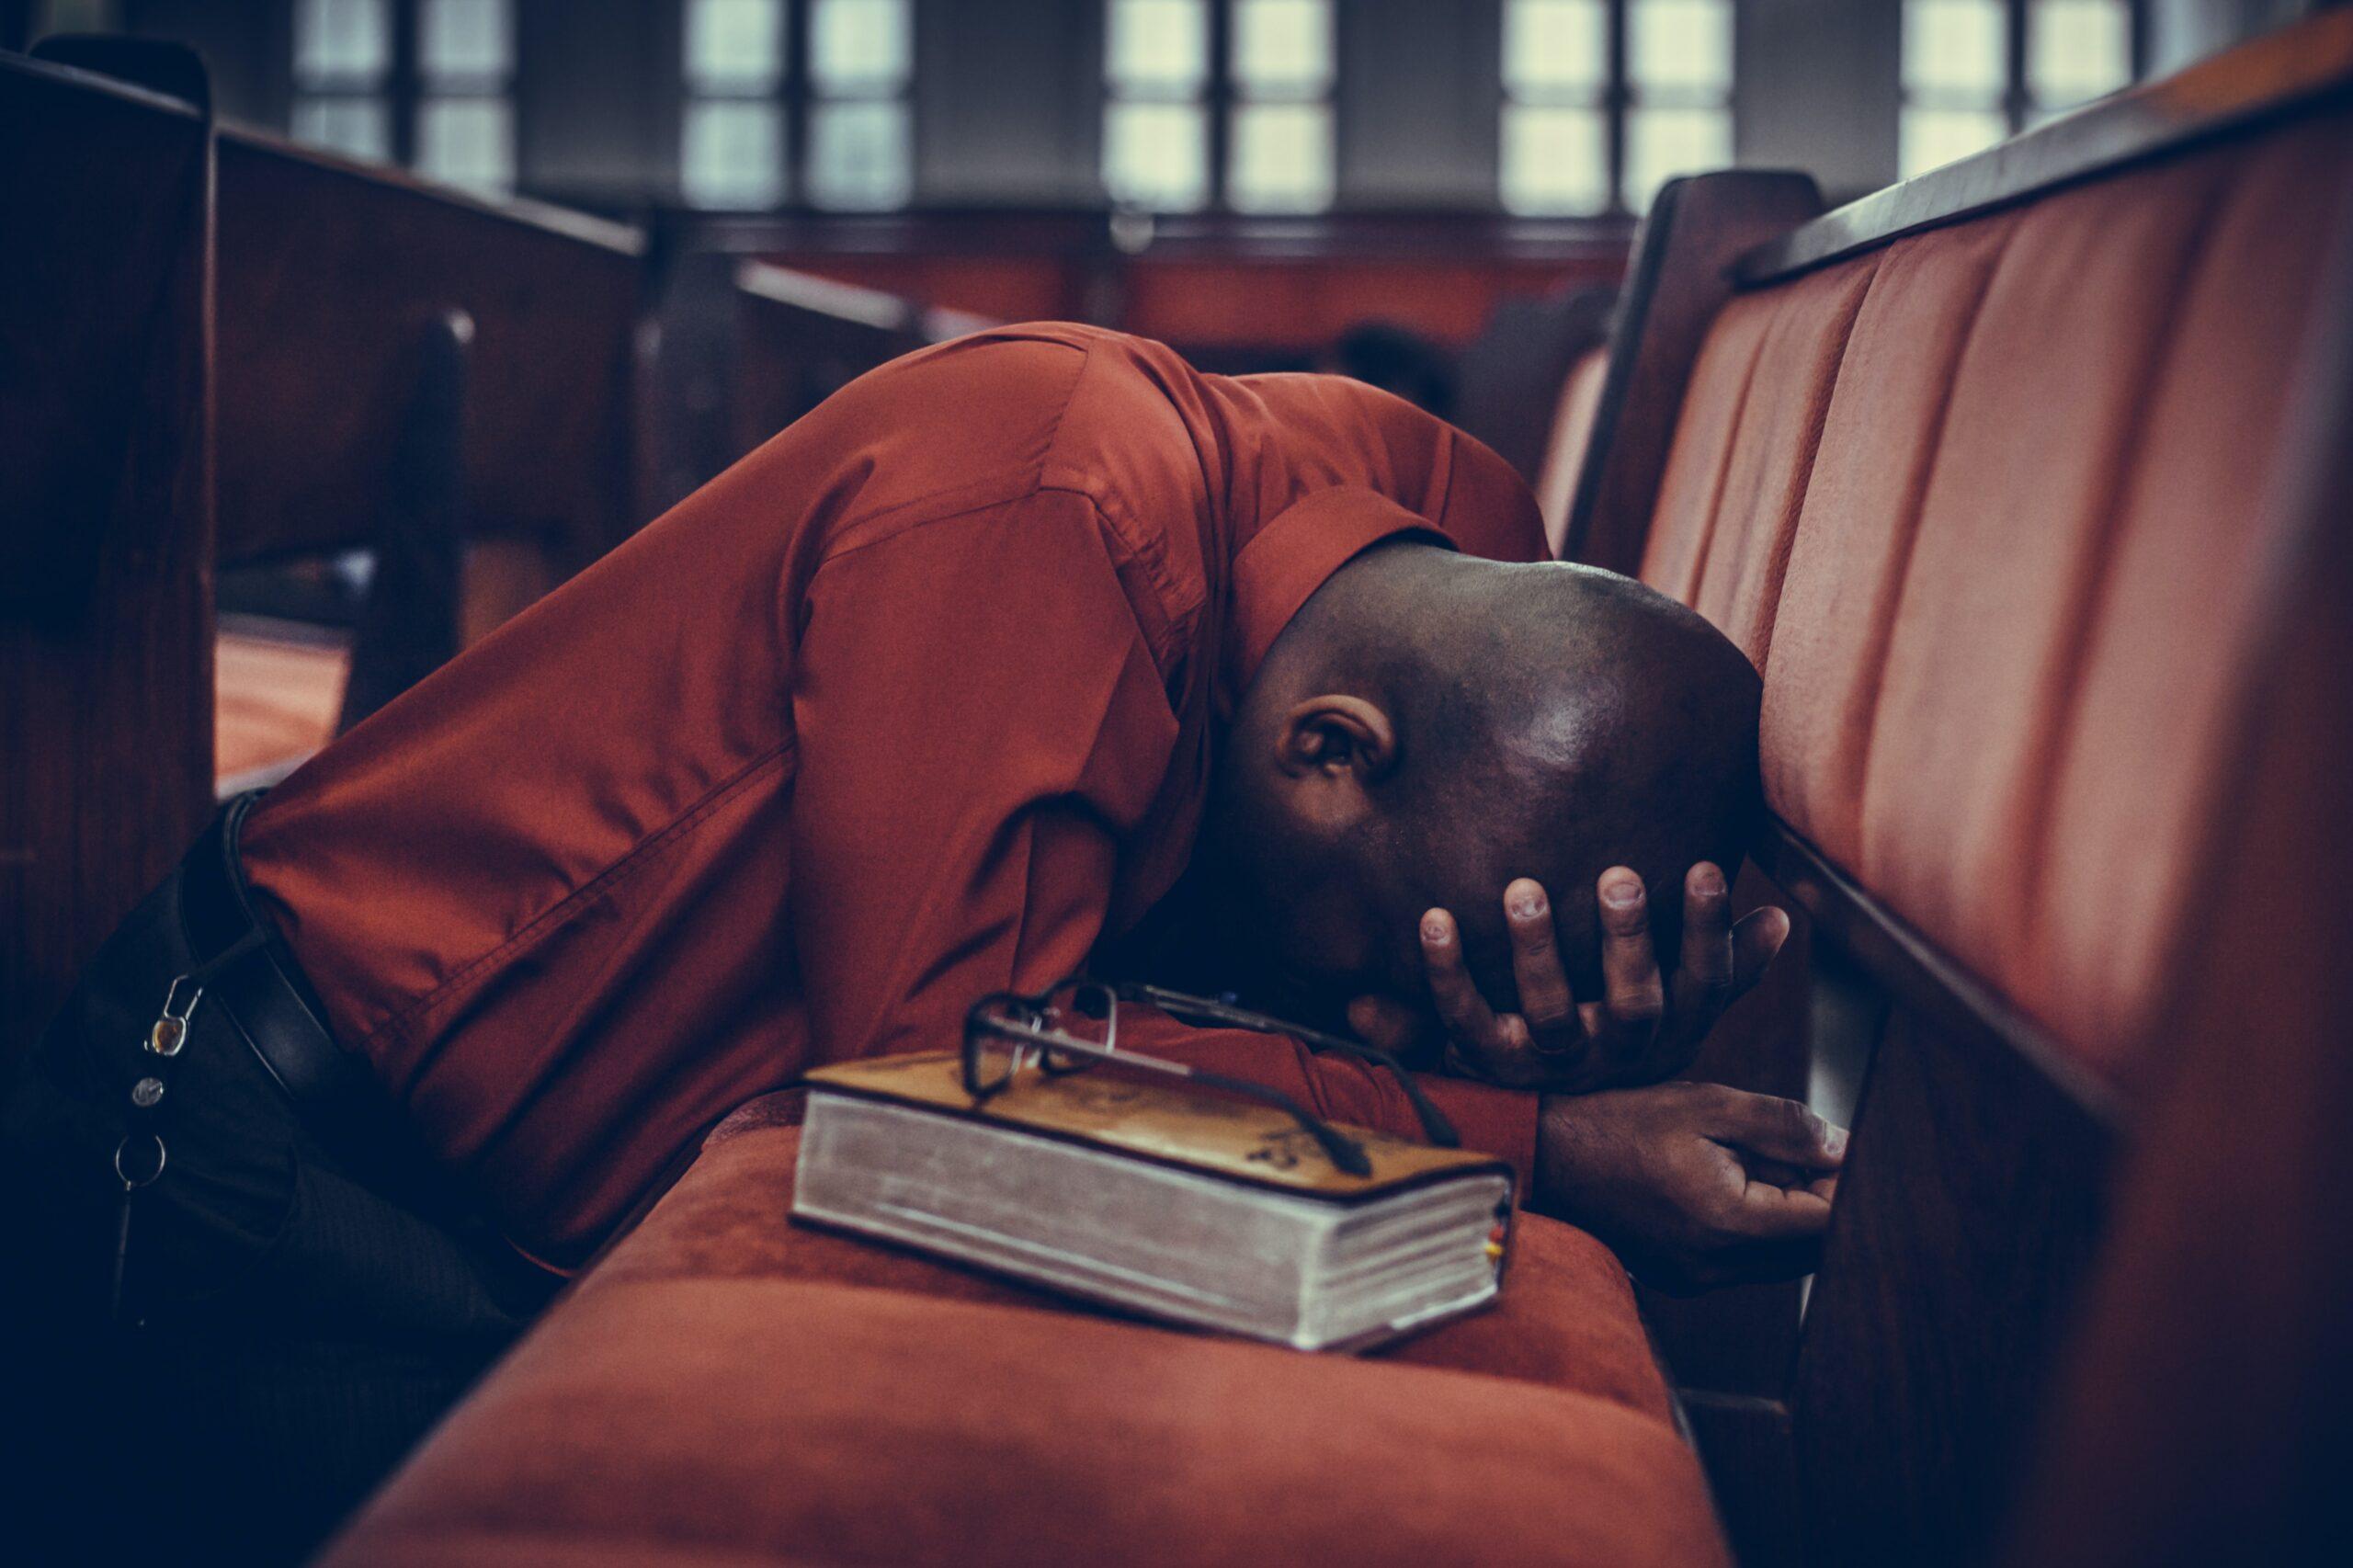 Sometimes our prayers seem to go unheard